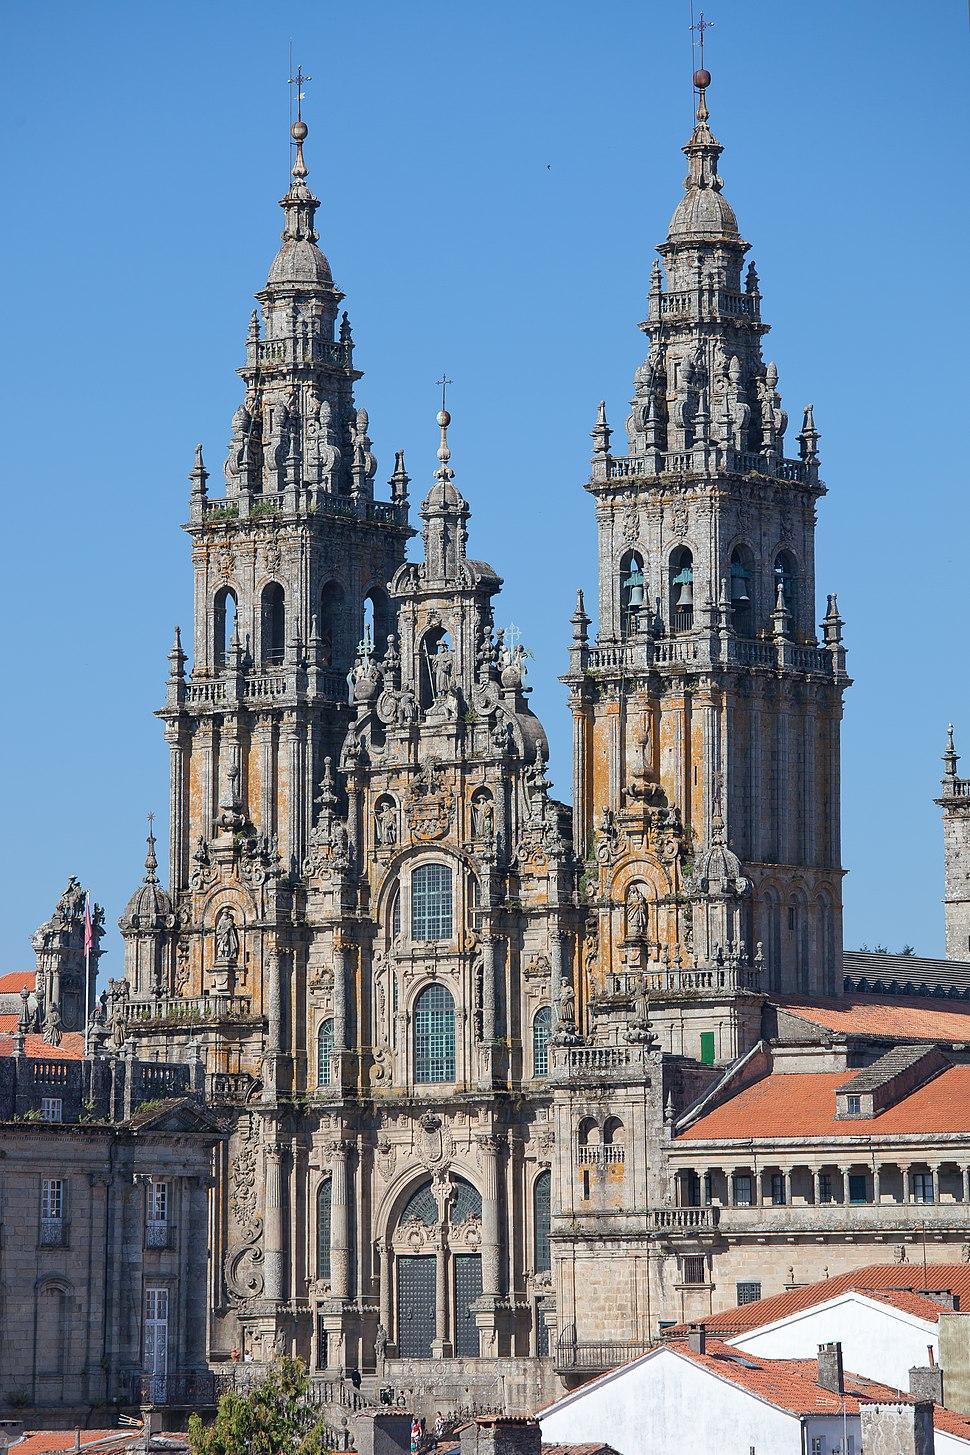 2010-Catedral de Santiago de Compostela-Galicia (Spain) 4